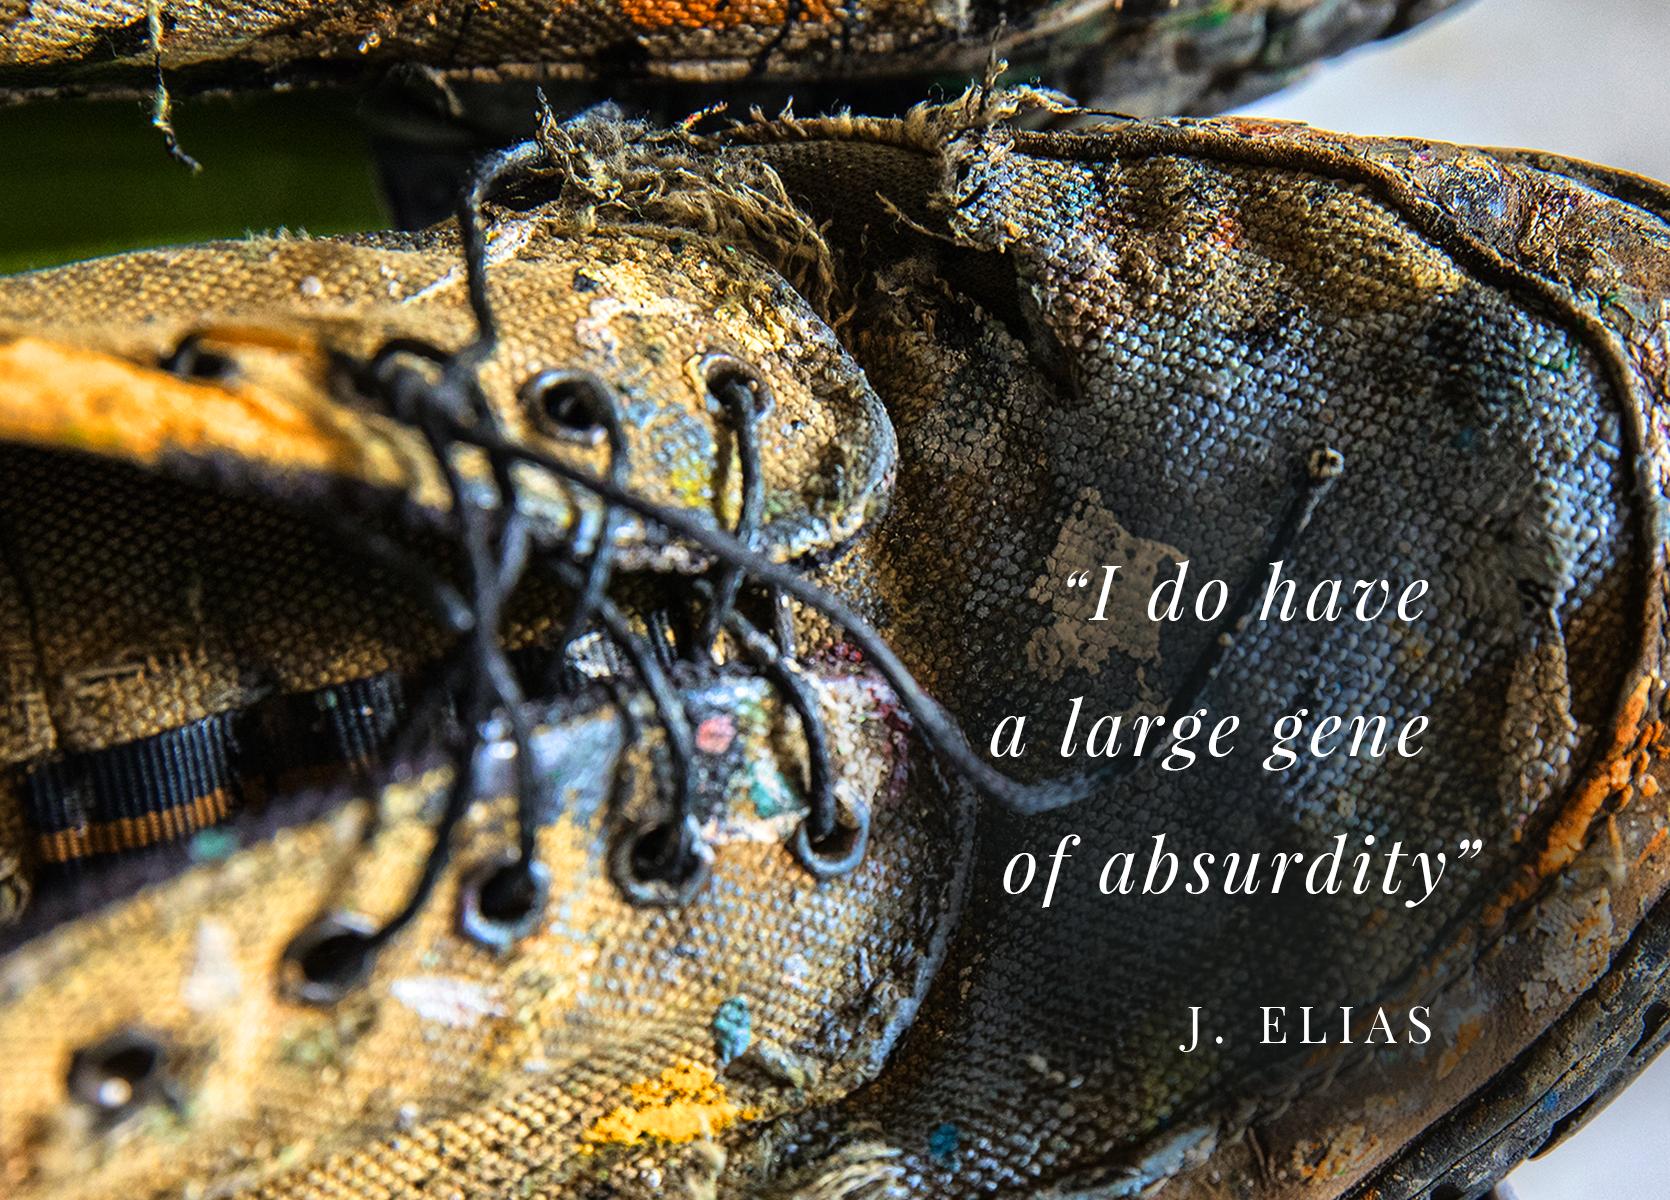 Absurdity-quote-Joshua-Elias.png